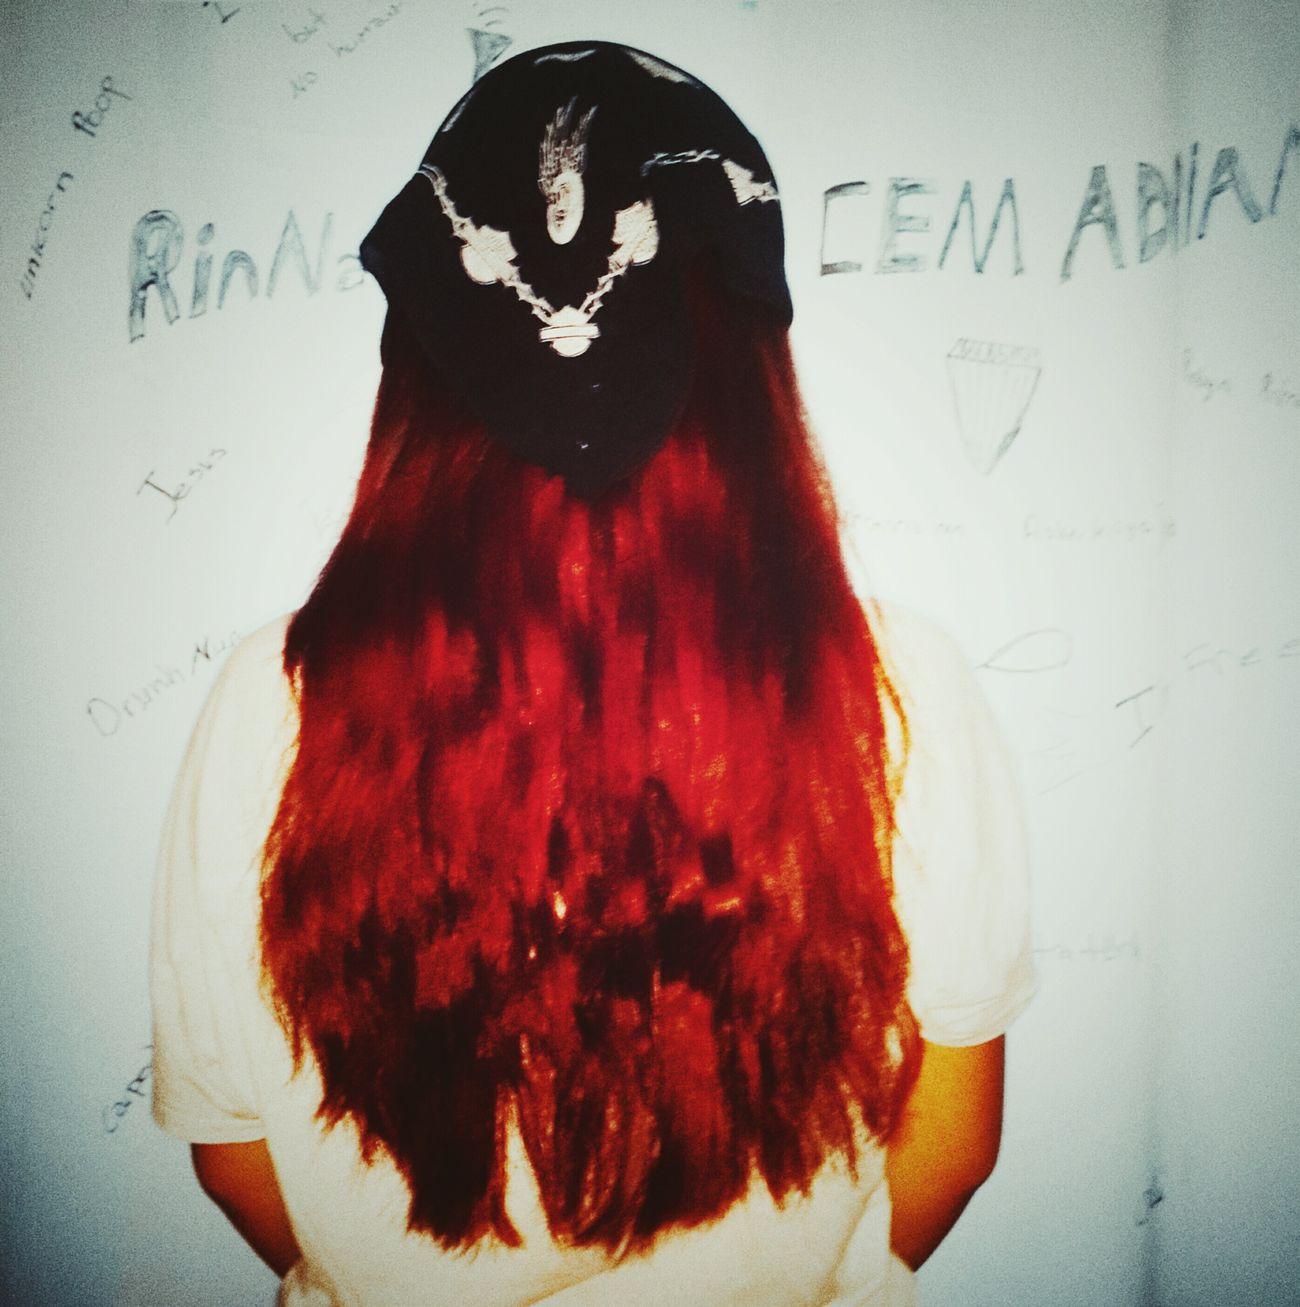 Redhairdon'tcare